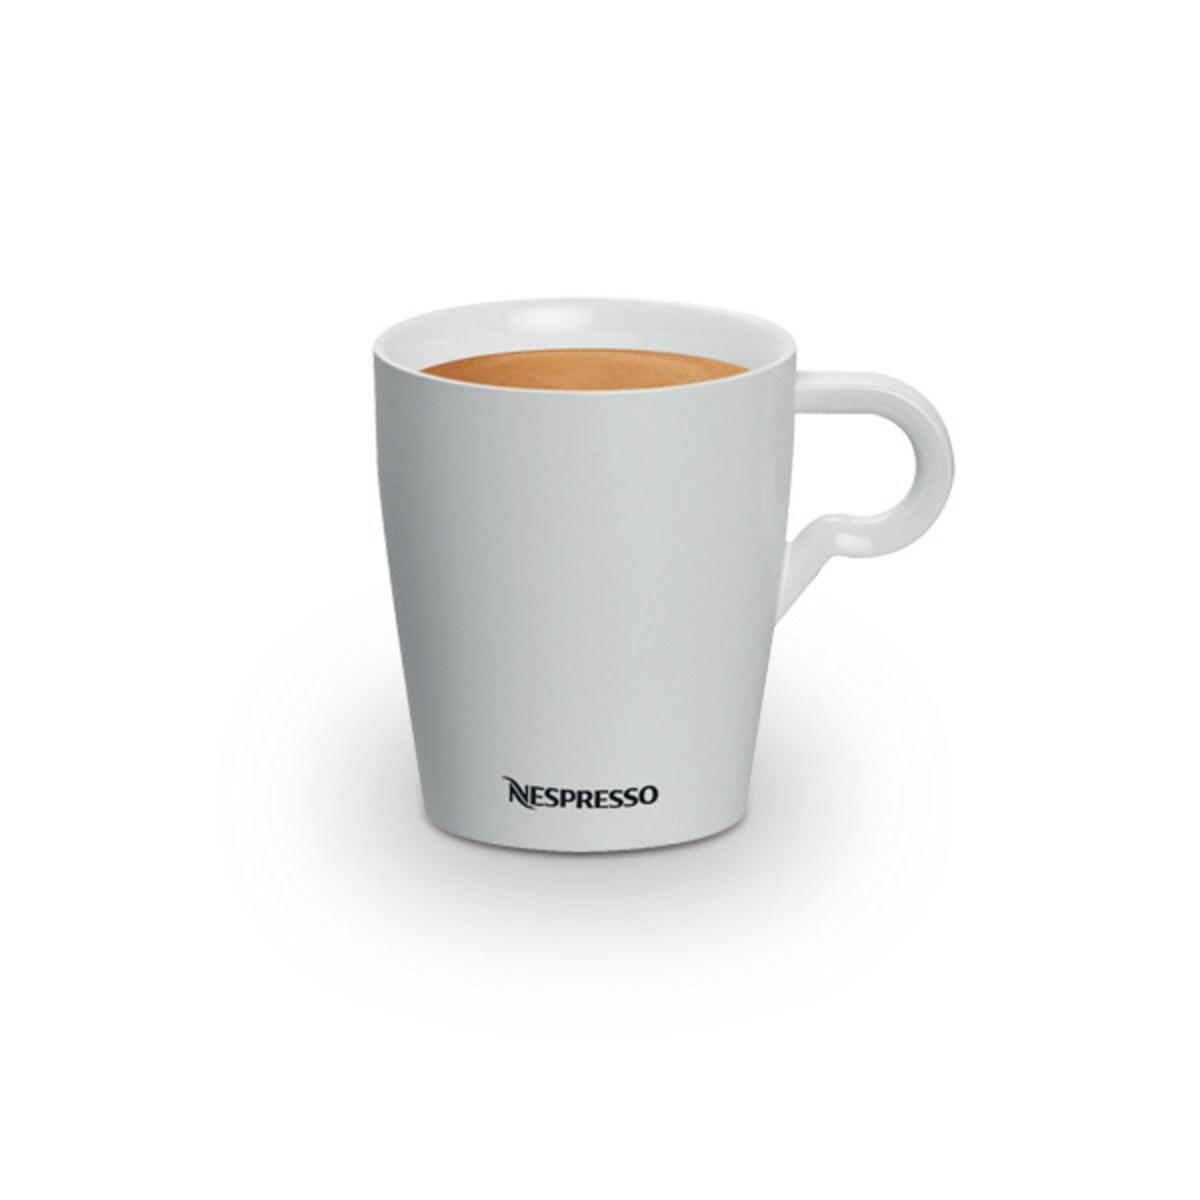 Nespresso Professional Lungo Cup